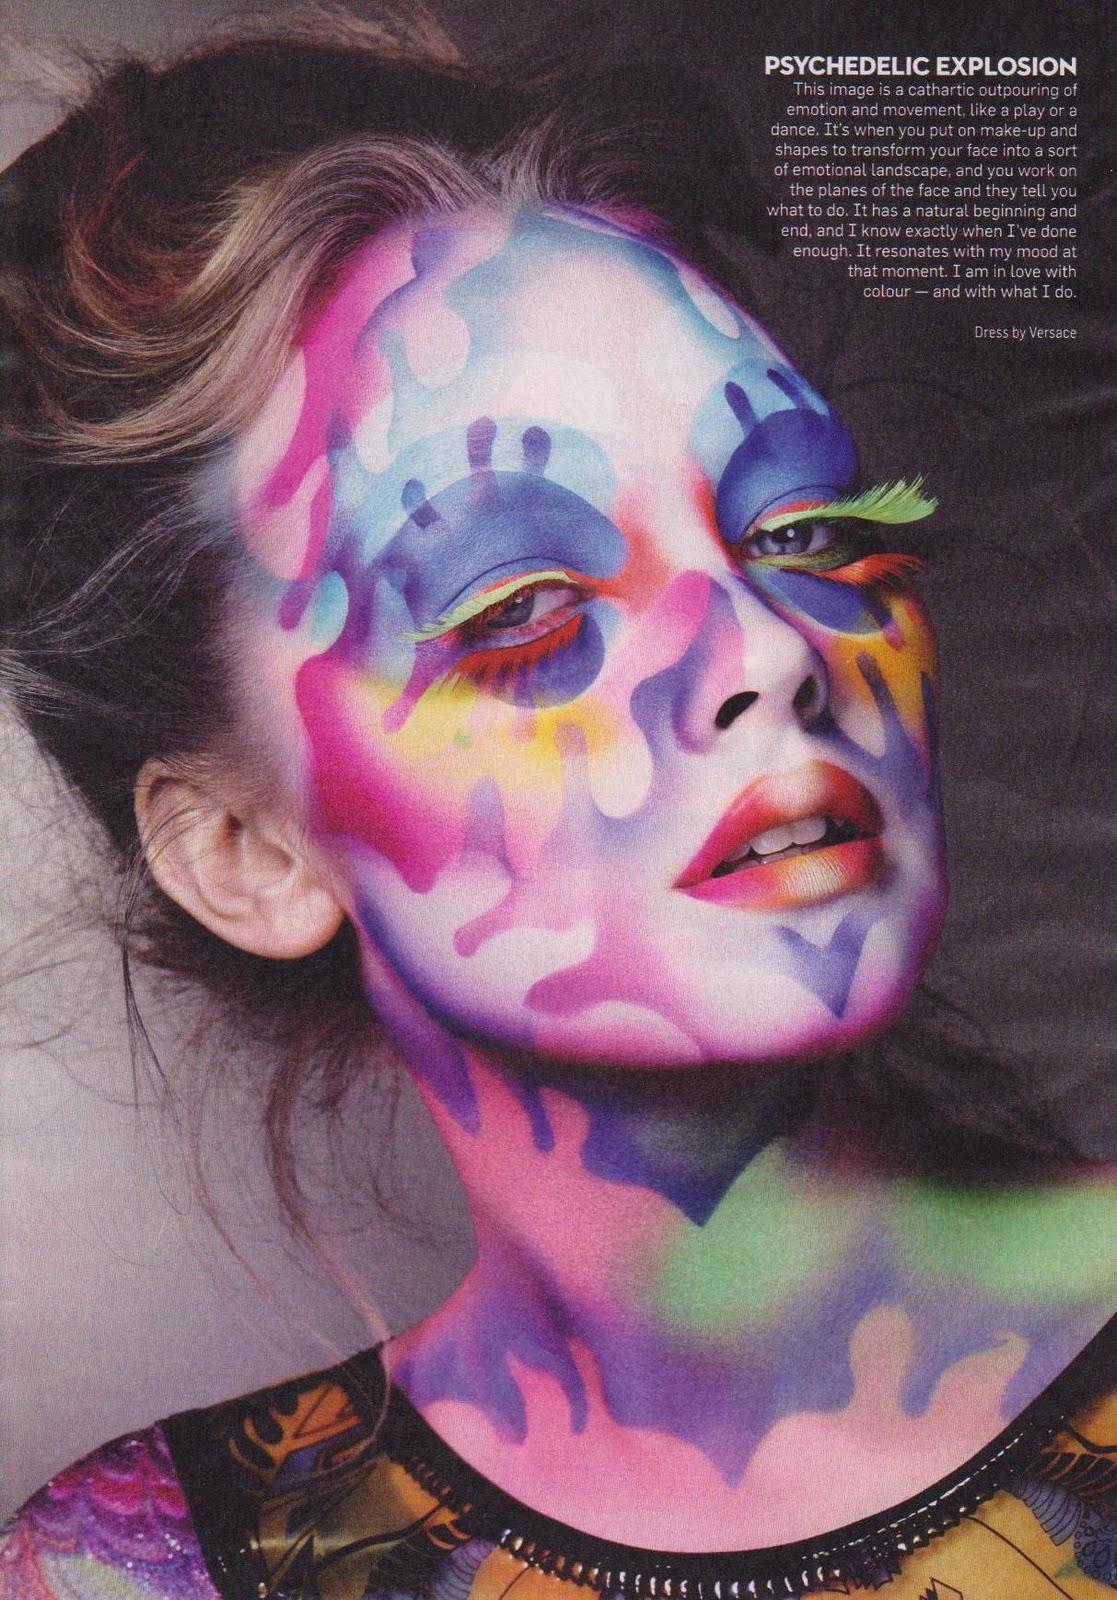 http://1.bp.blogspot.com/-WA8JaXM8n4Y/TZSD8RKzzDI/AAAAAAAABhY/PUyw8roU6FE/s1600/alex-bok-face-painting-0013.jpg